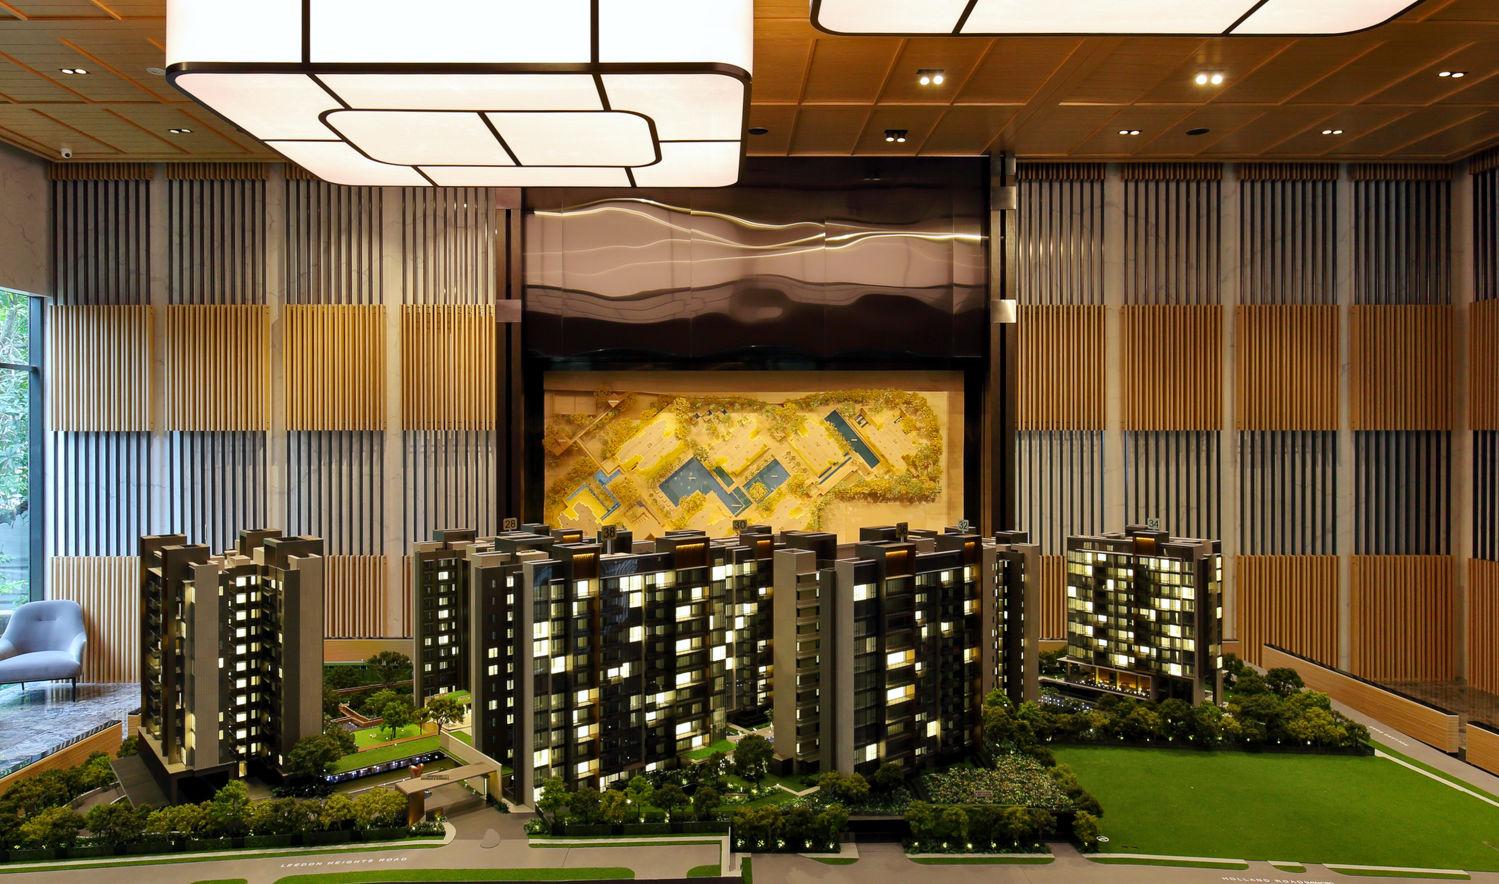 Leedon Green scale model - EDGEPROP SINGAPORE